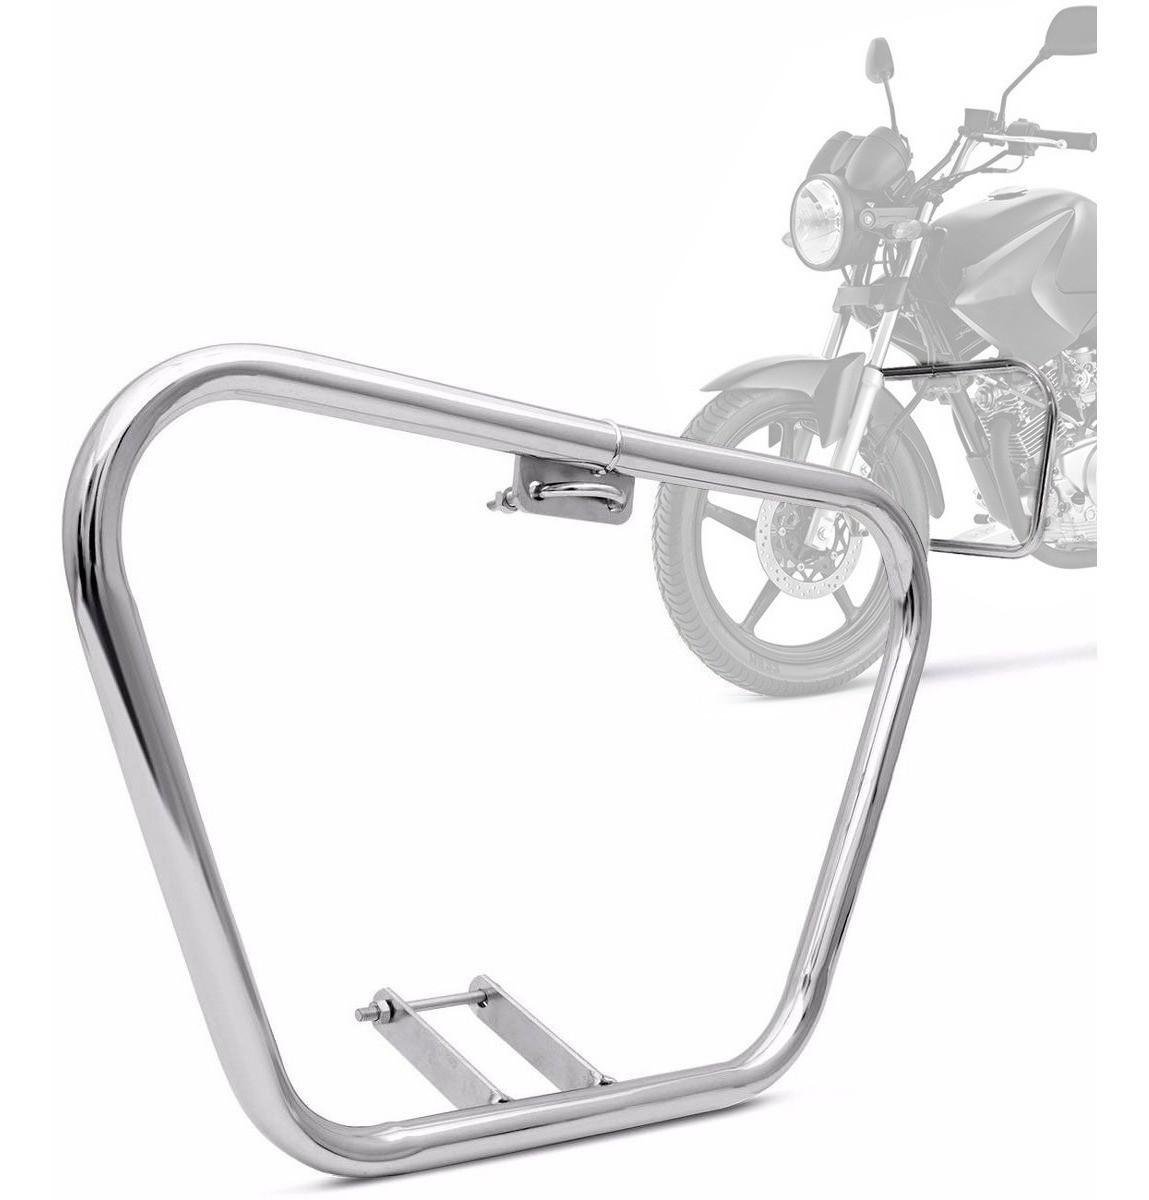 Mata Cachorro Moto Tradicional Honda CG Pro Tork